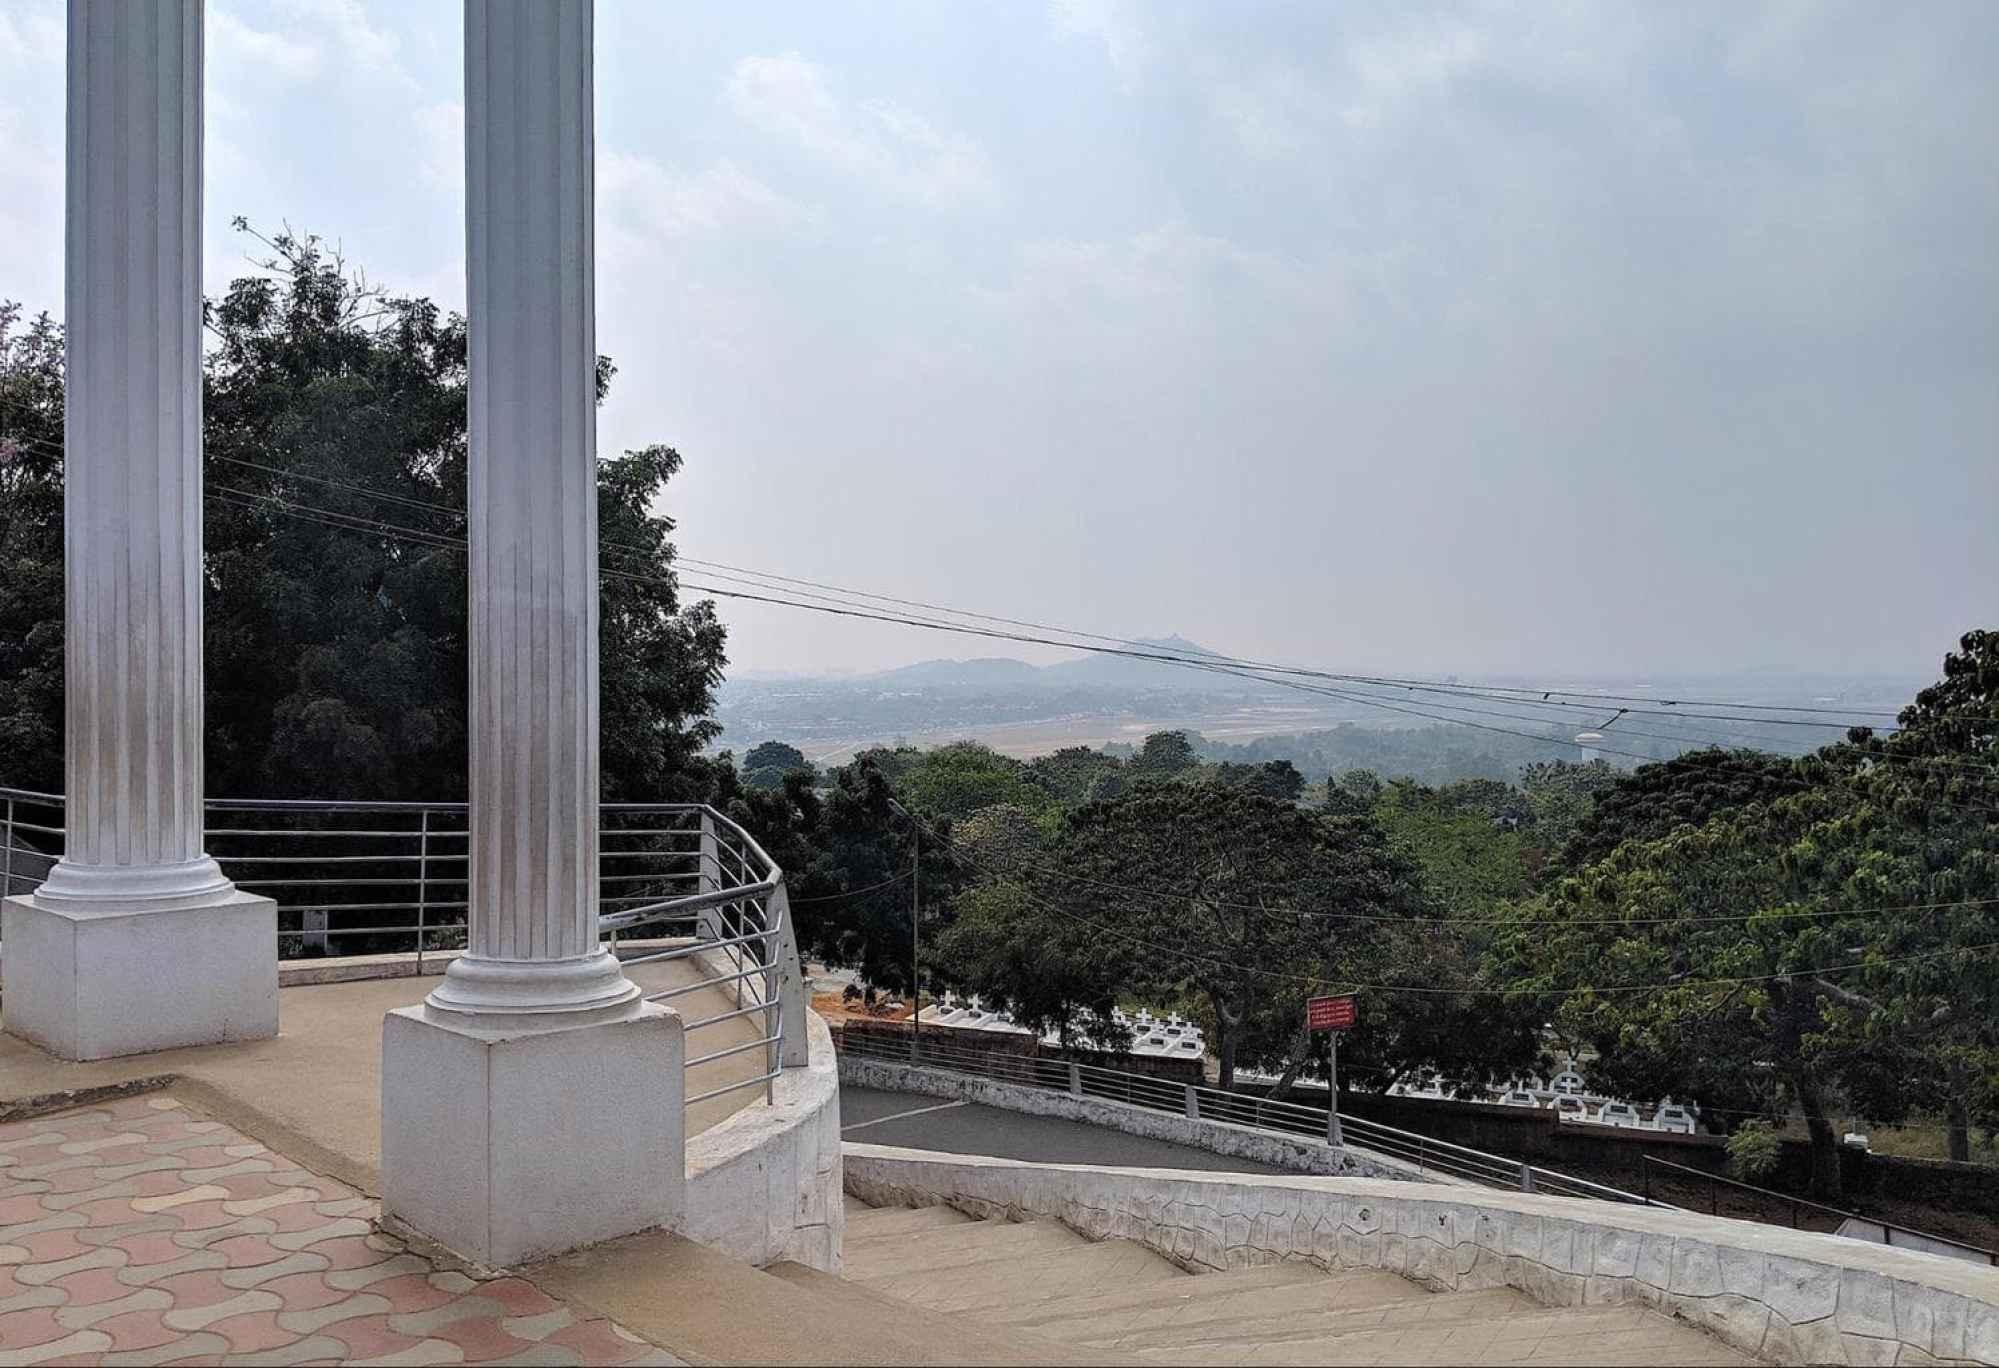 St. Thomas Mount National Shrine view